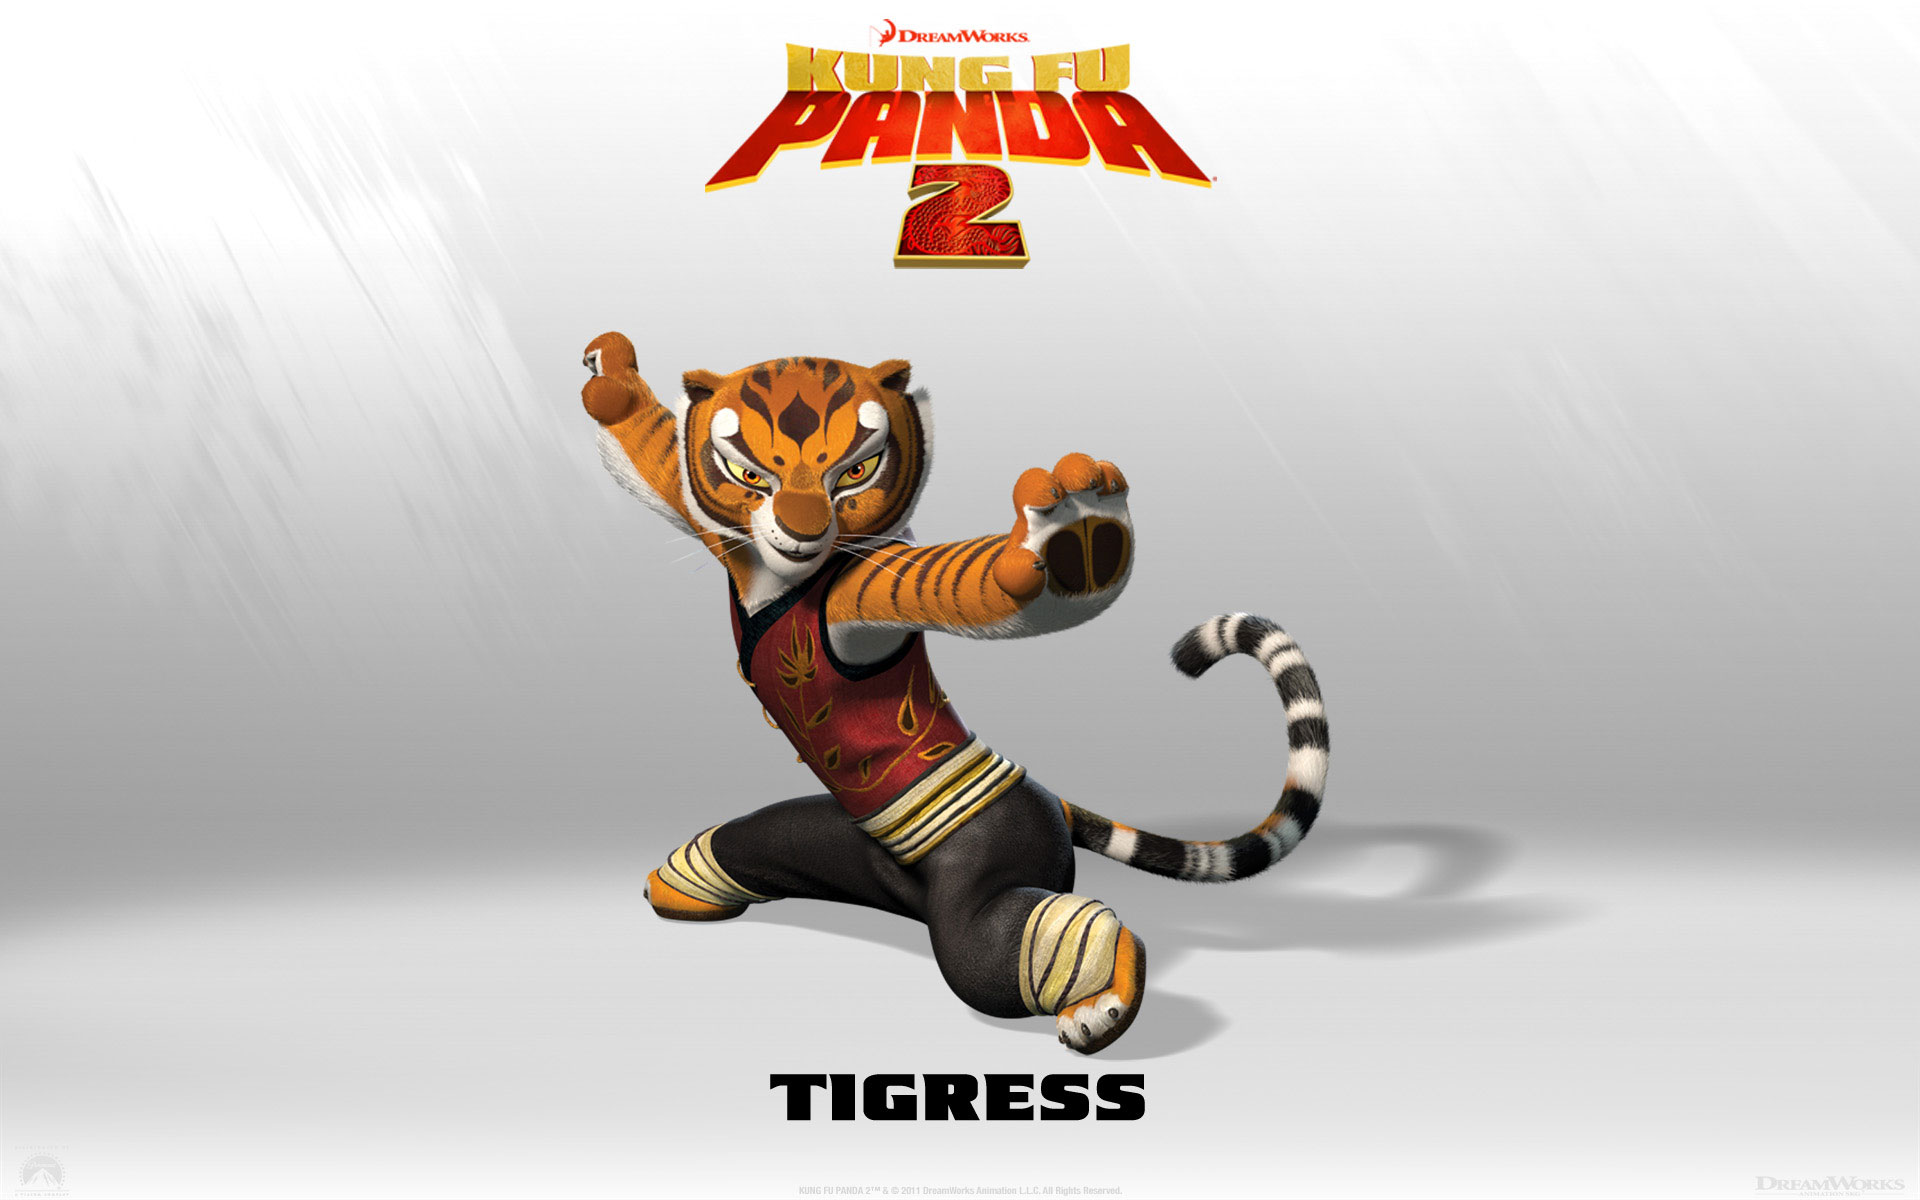 Kung Fu Panda 2 Tigress wallpaper